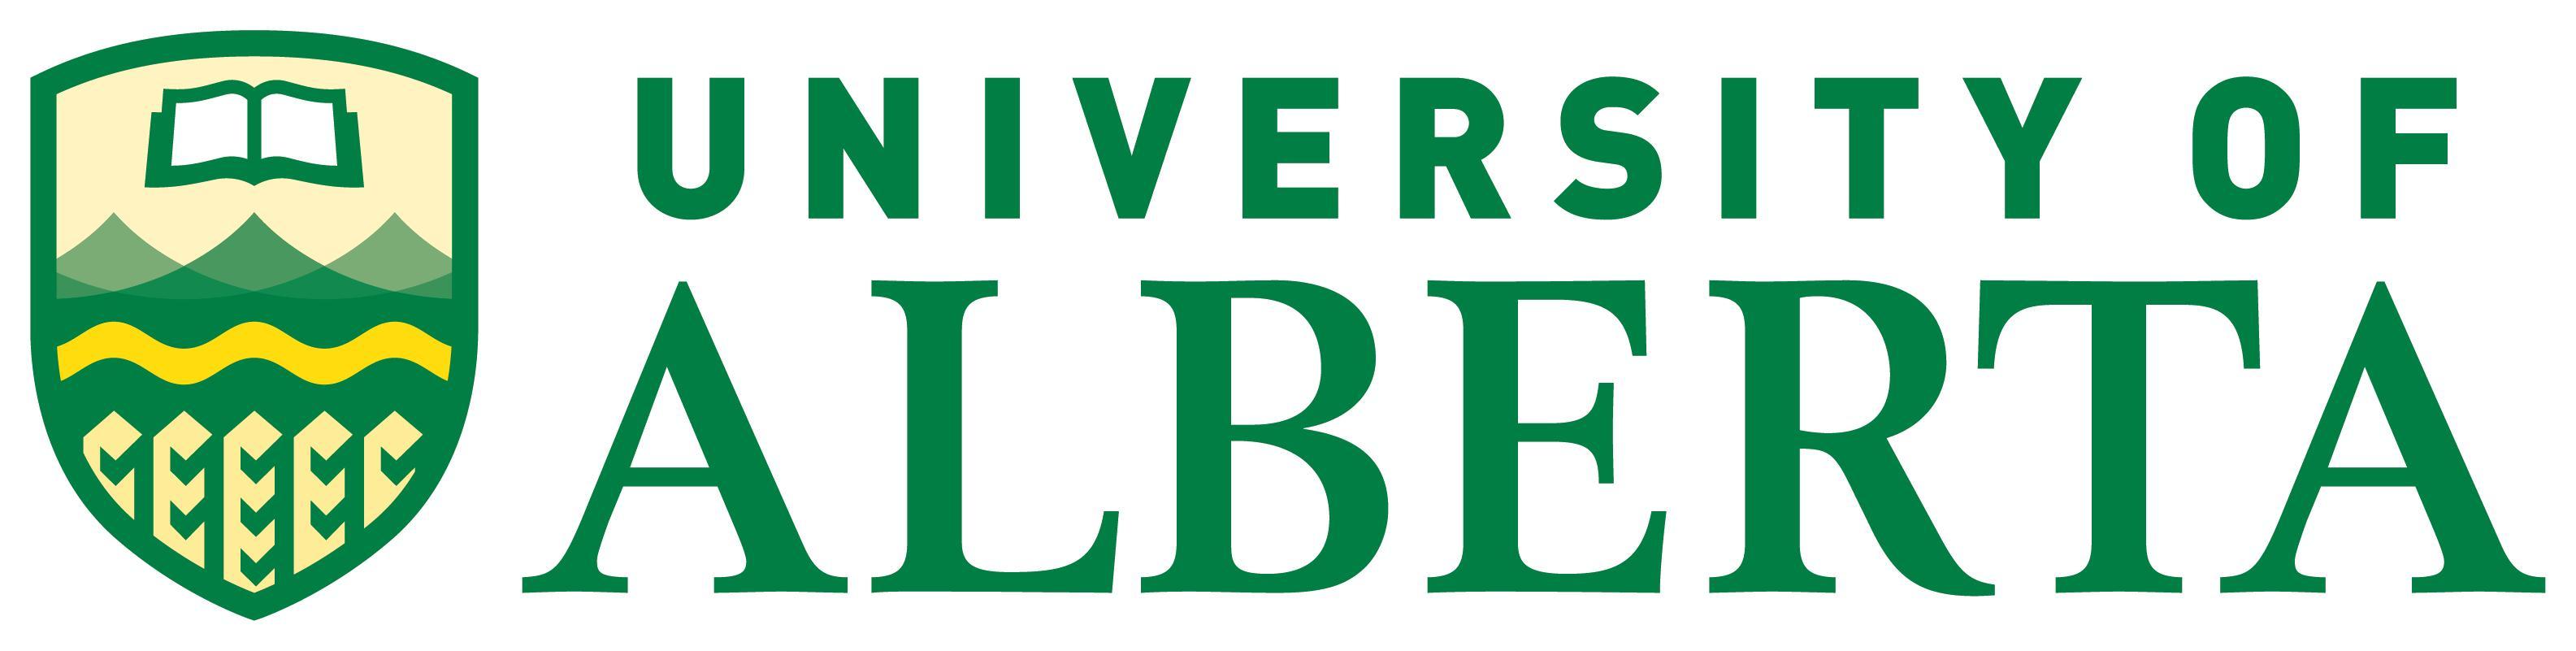 University of Alberta (Department of Psychiatry).